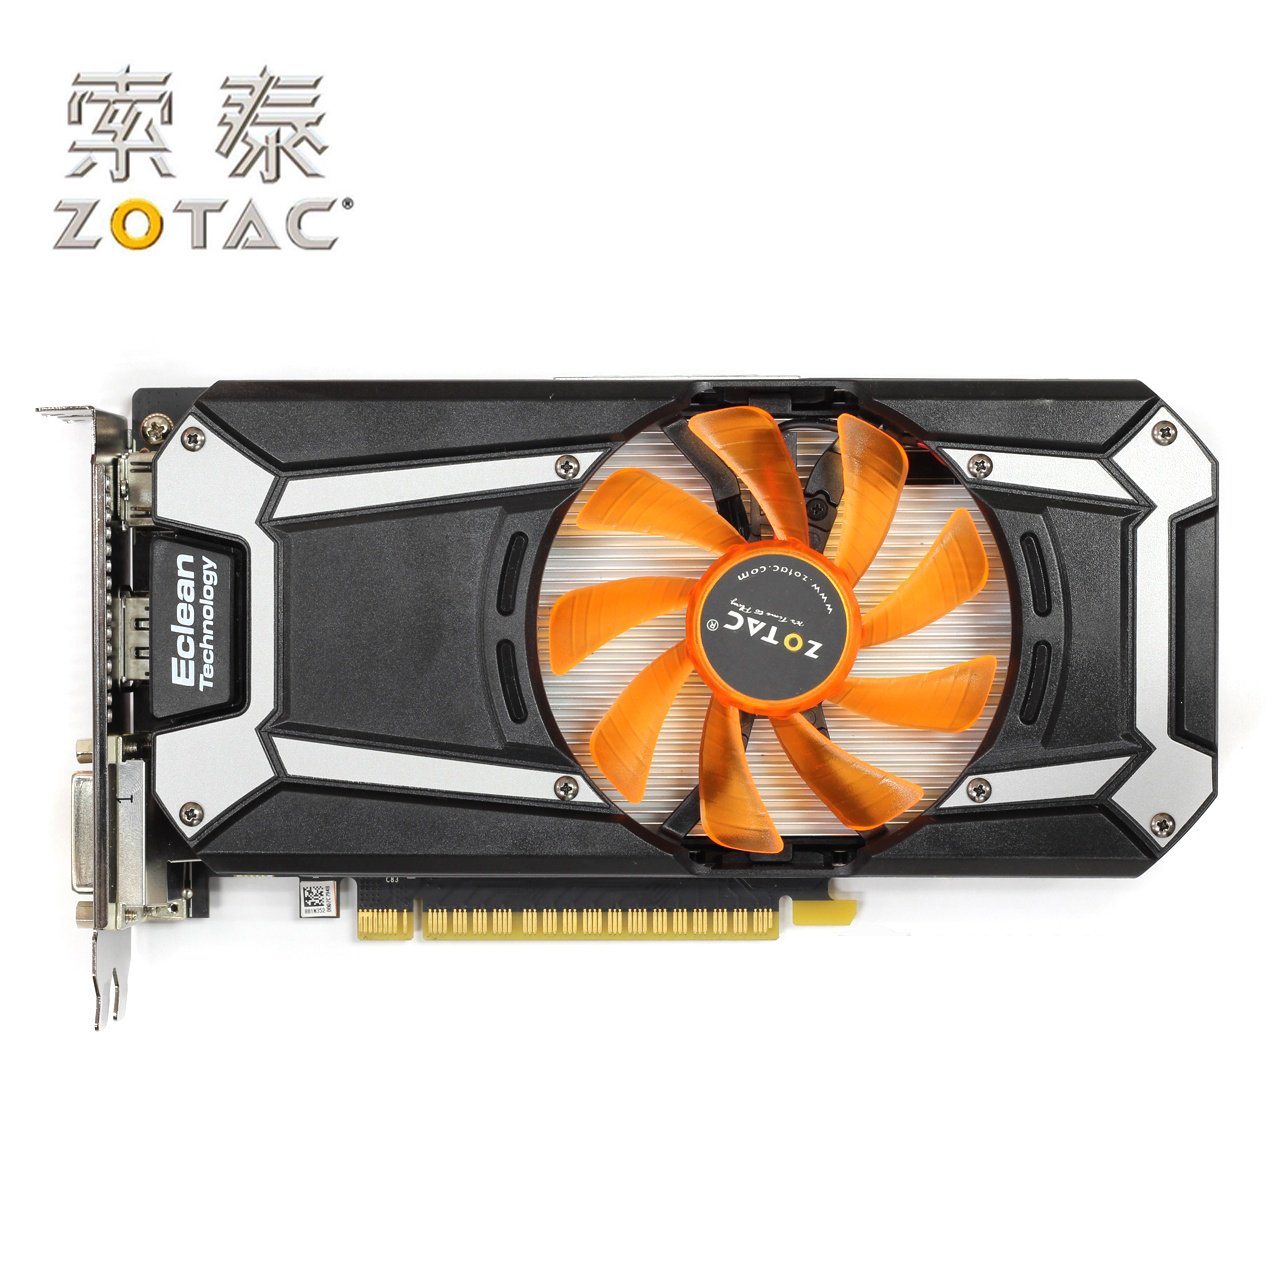 Original ZOTAC GeForce GTX 750Ti-1GD5 Graphics Card Thunder HA For NVIDIA GTX750 GT700 1GD5 1G Video Cards 6000MHz GDDR5 Used vg 86m06 006 gpu for acer aspire 6530g notebook pc graphics card ati hd3650 video card